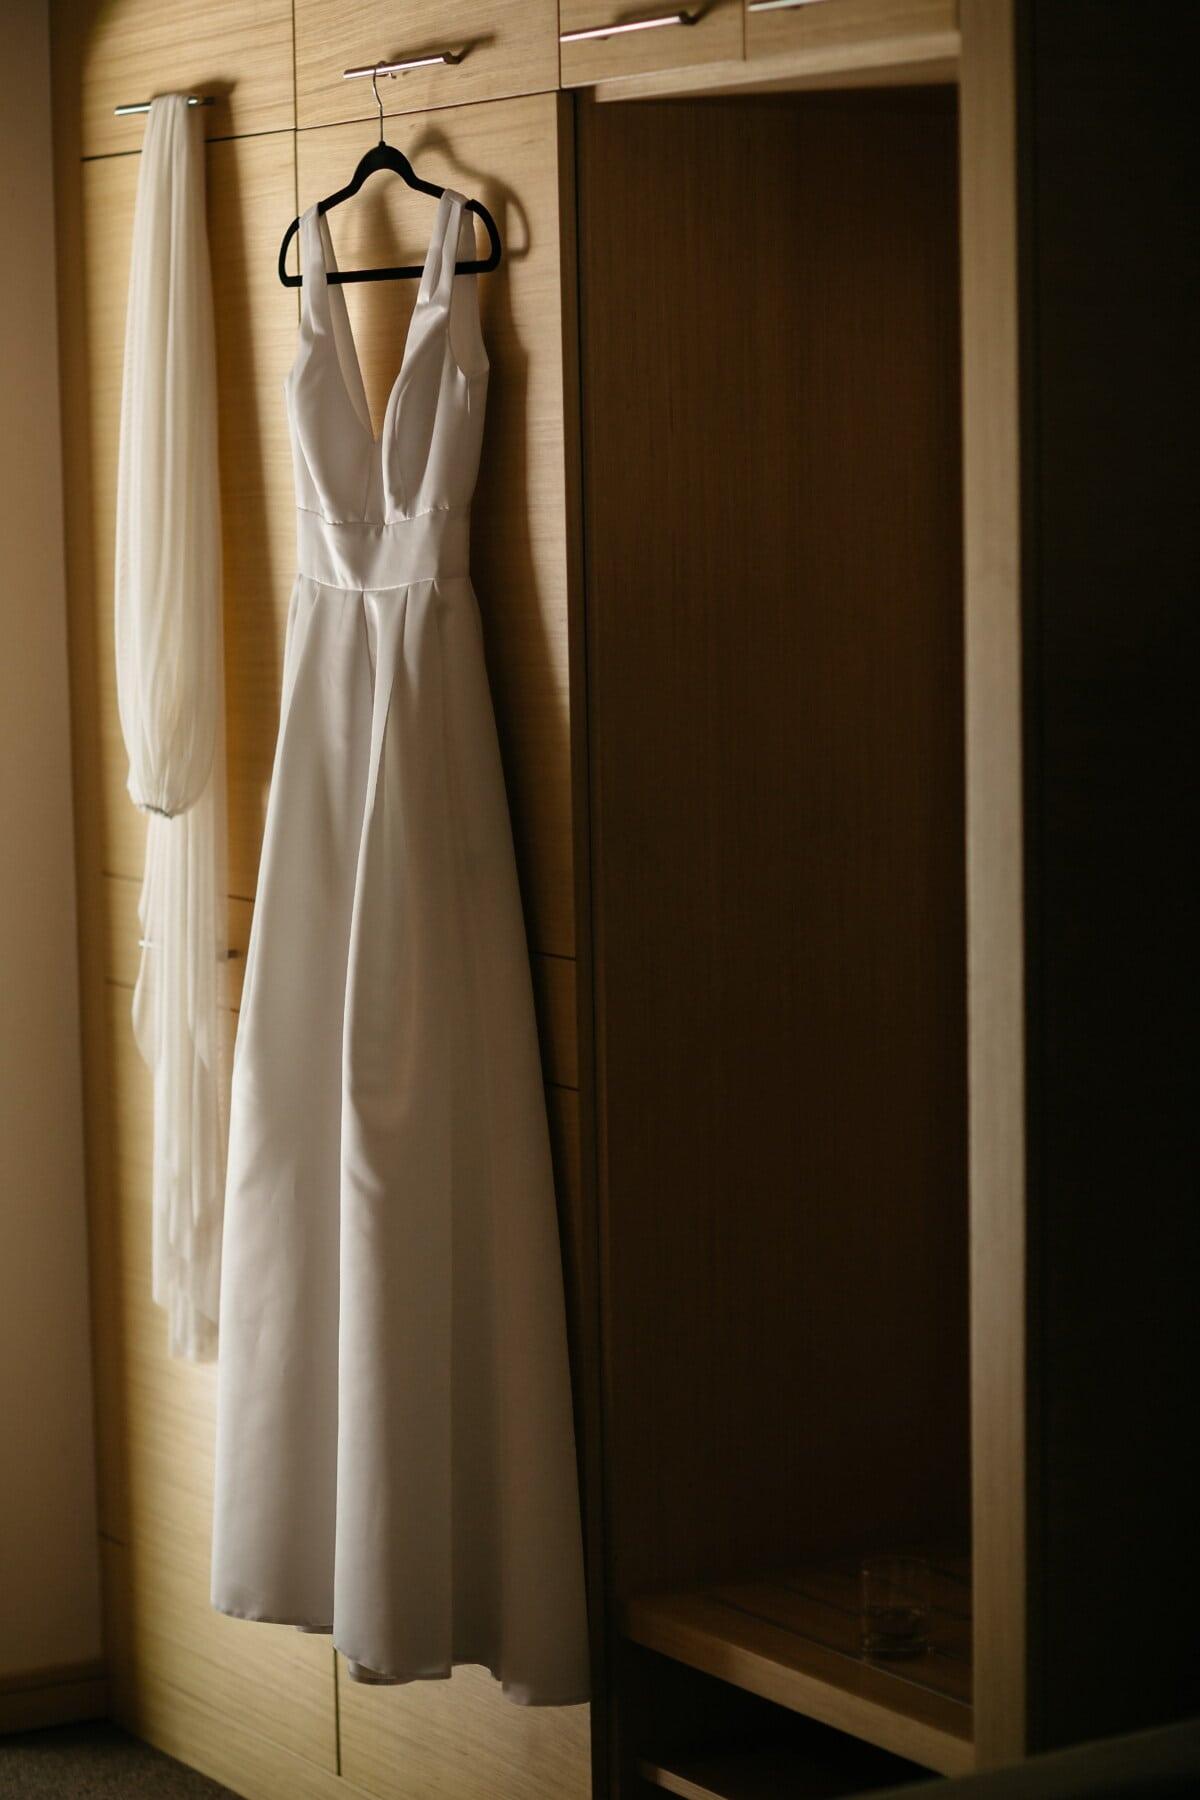 wedding dress, wardrobe, hanging, hanger, fashion, dress, indoors, wood, wedding, room